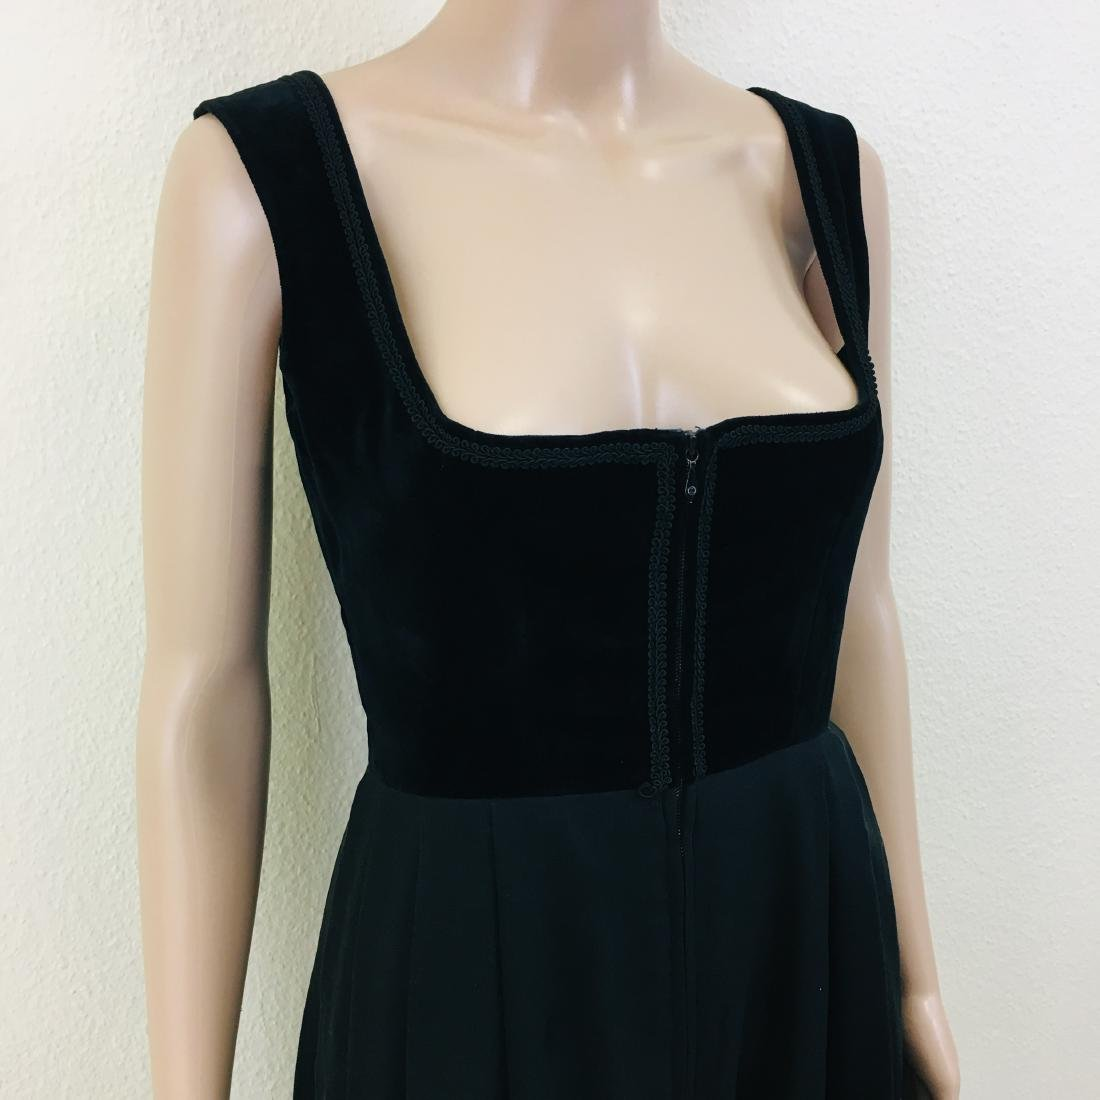 Vintage Women's Black Tyrolean Drindl Dress - 4